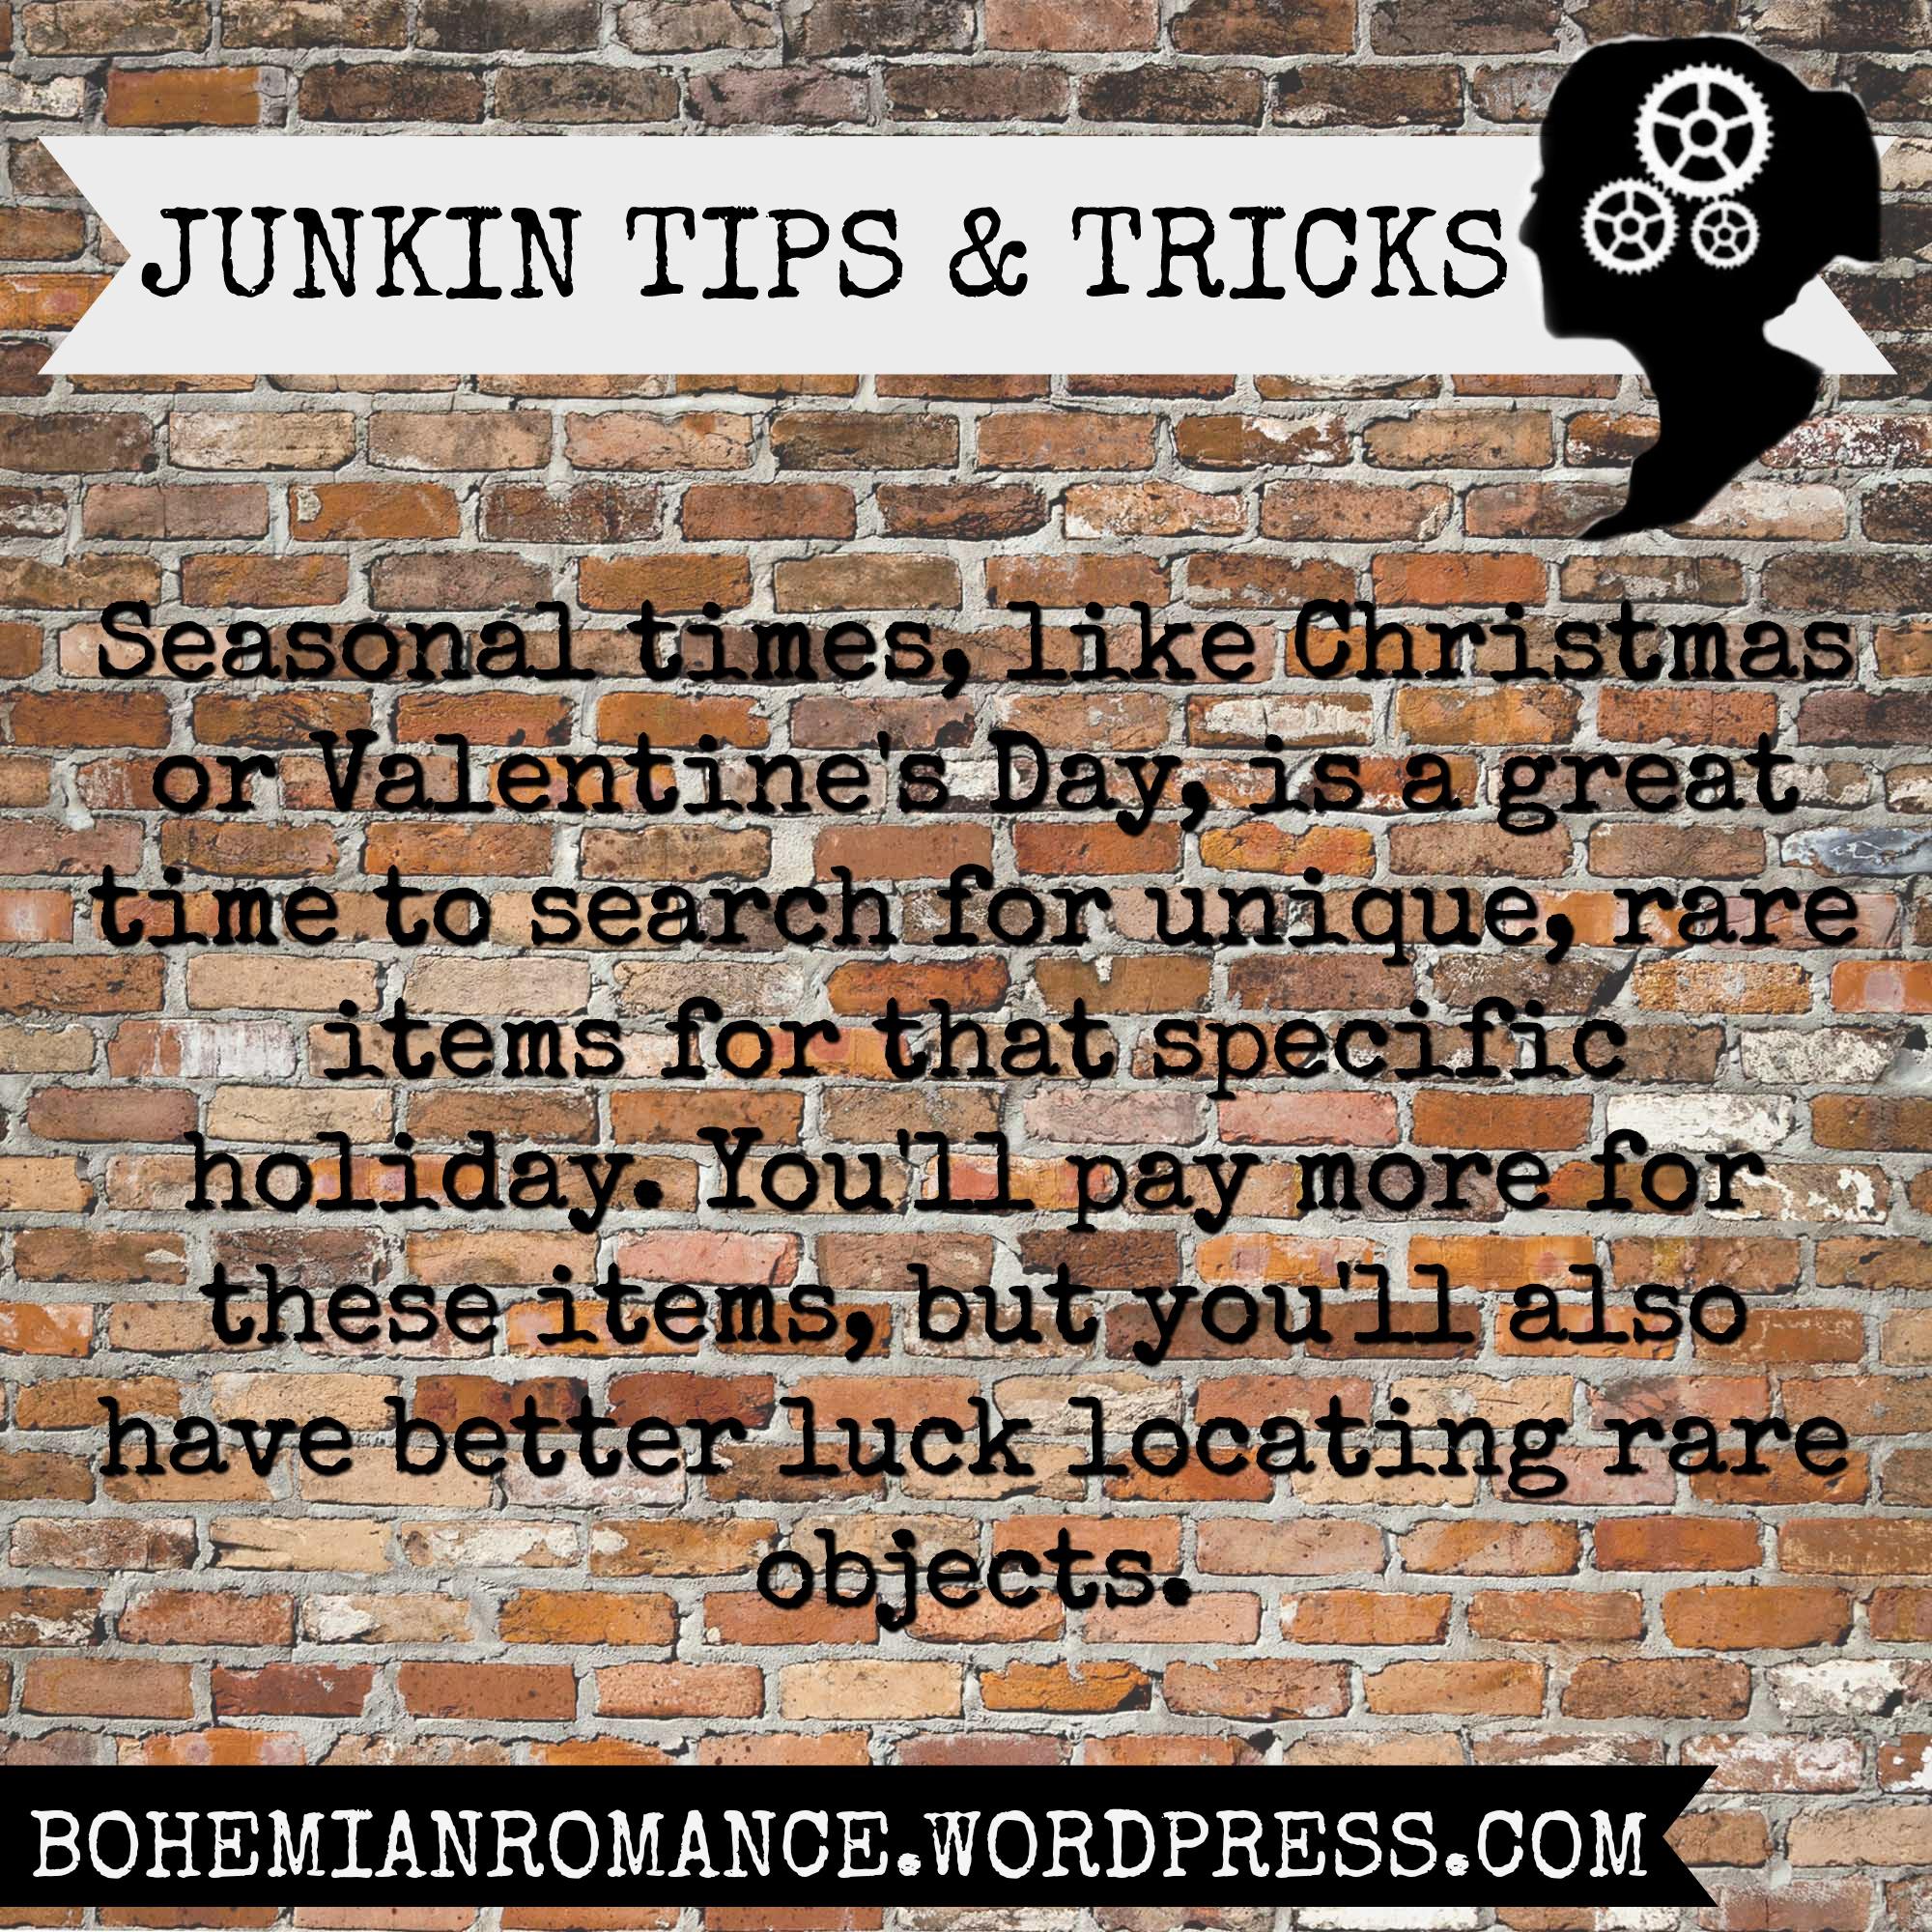 36-junkin-tips-tricks-template